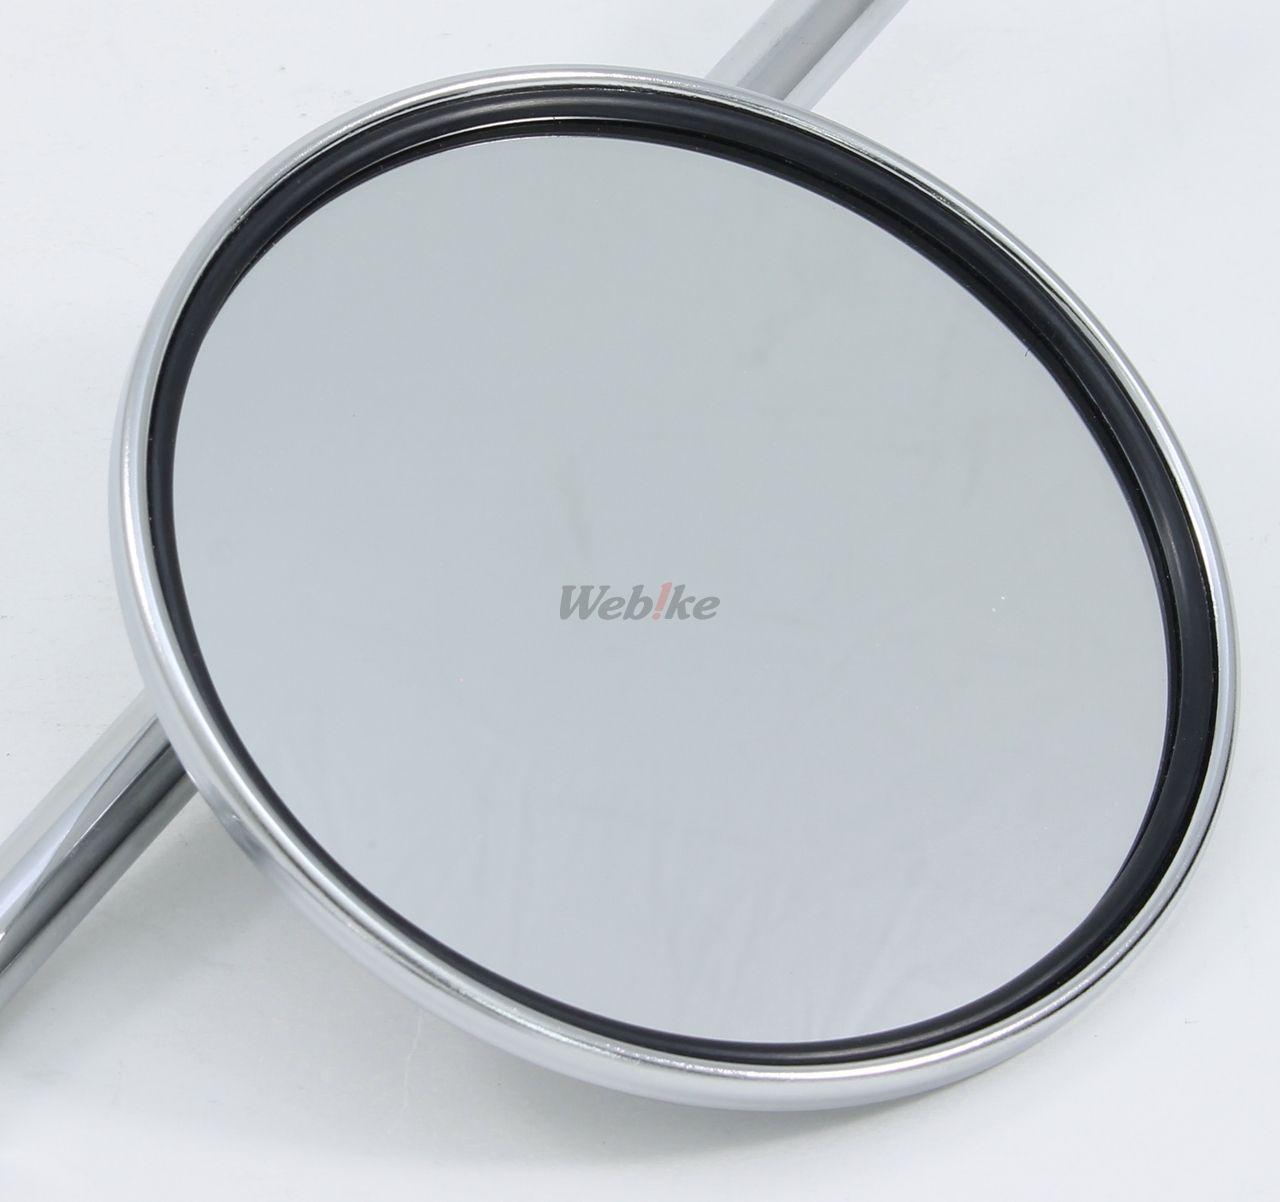 【SHIFT UP】WHR1 Classical 後視鏡 - 「Webike-摩托百貨」